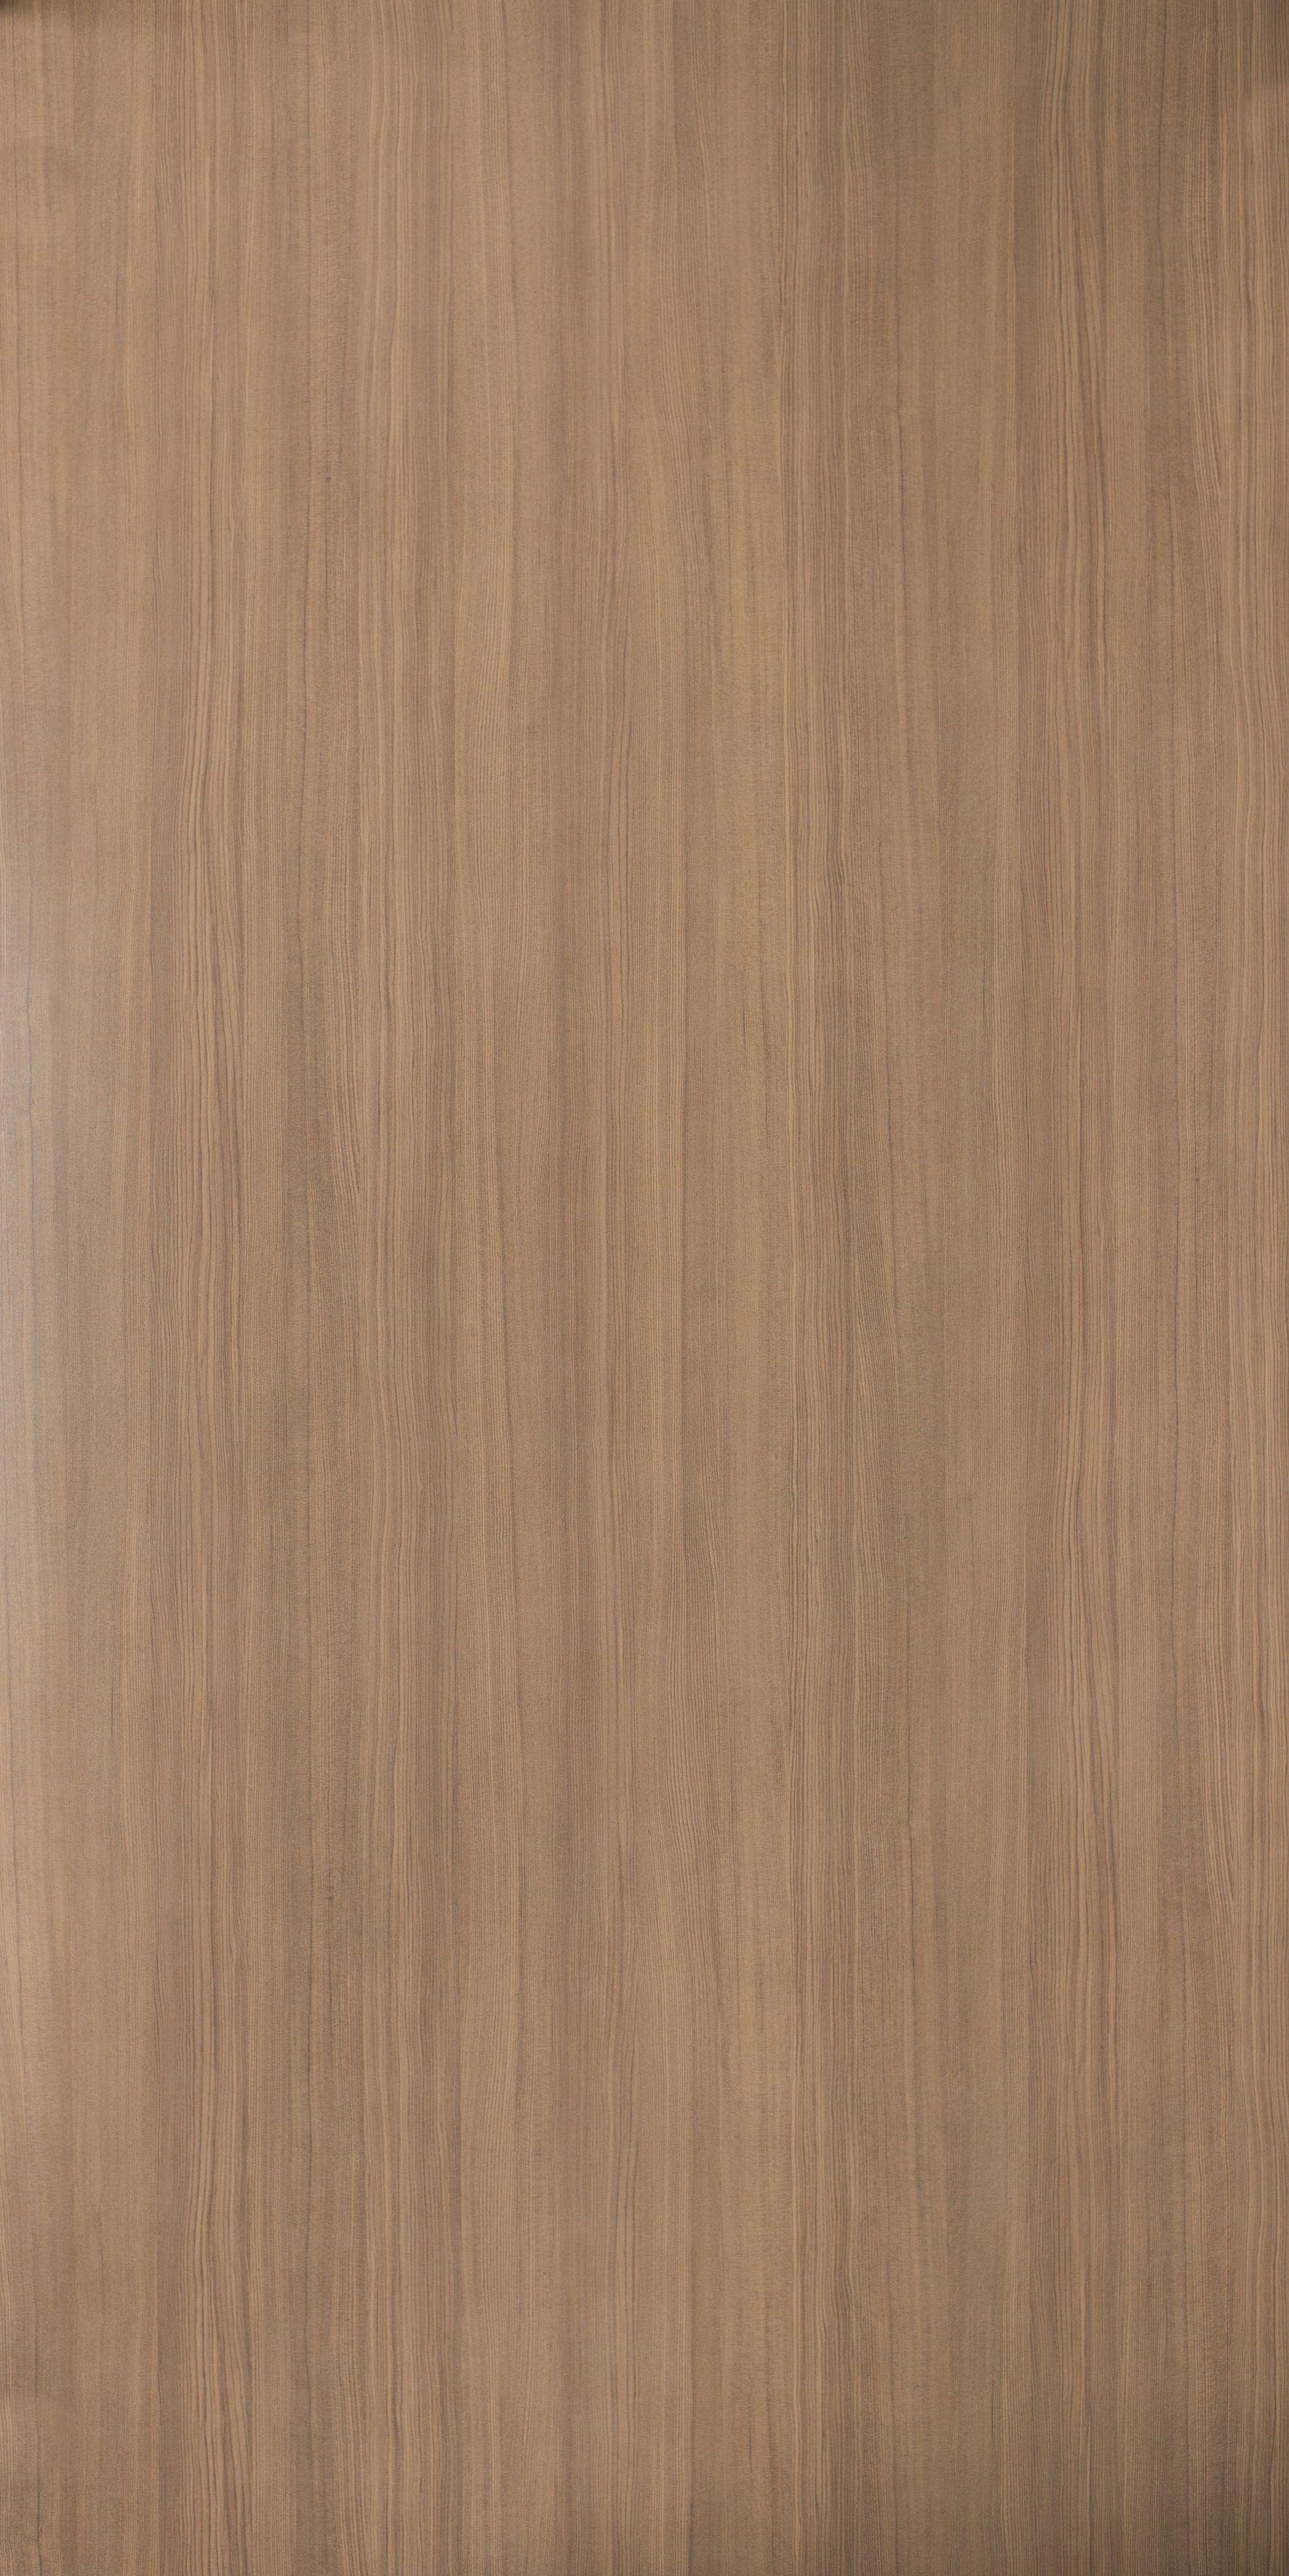 Wood Grain Plastic Laminates Octopus Products Wood Tile Texture Laminate Texture Wood Texture